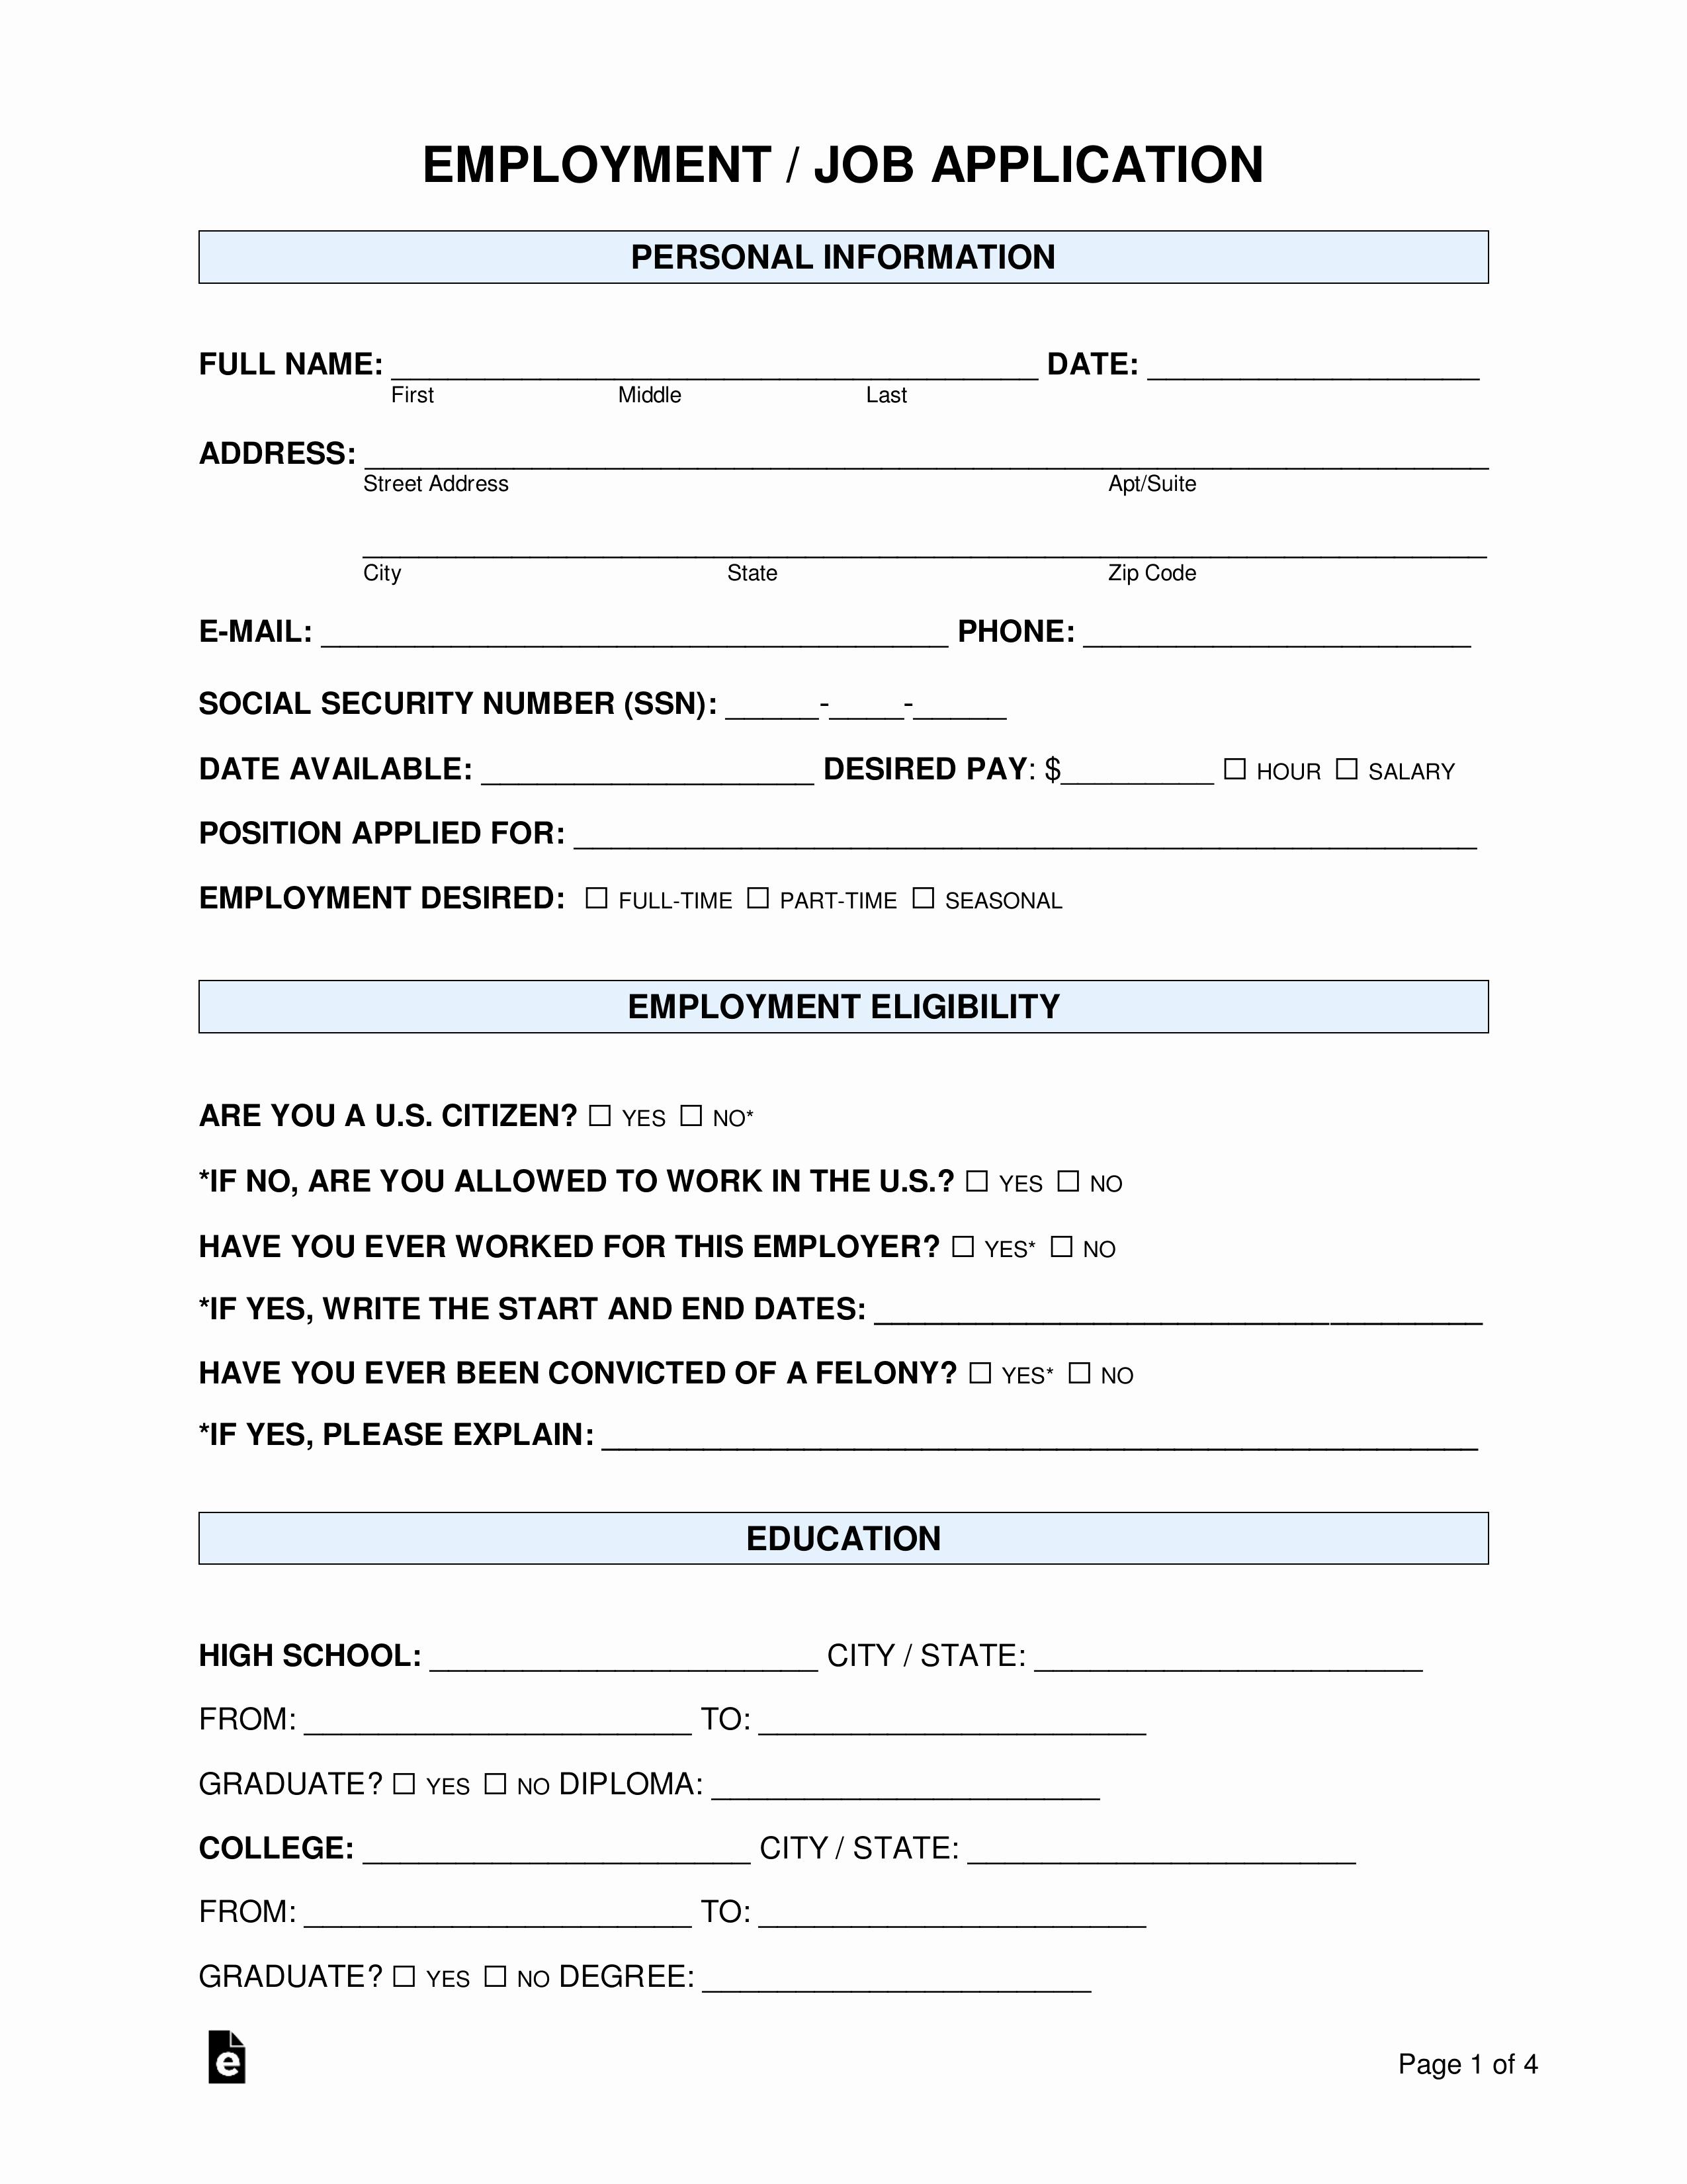 Job Application Template Doc Best Of Free Job Application form Standard Template Pdf Word